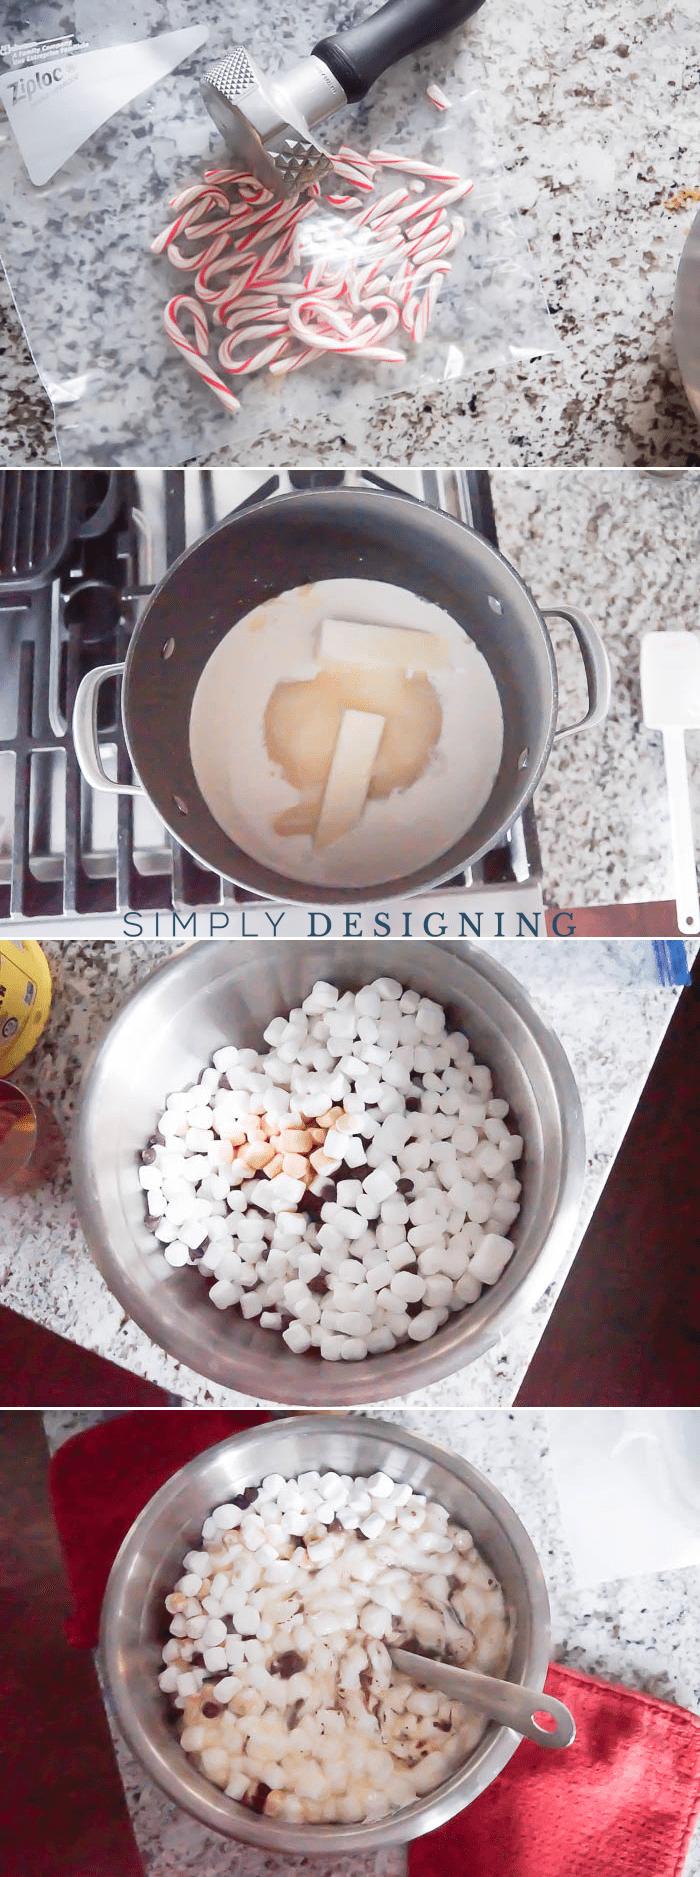 How to make Chocolate Peppermint Fudge